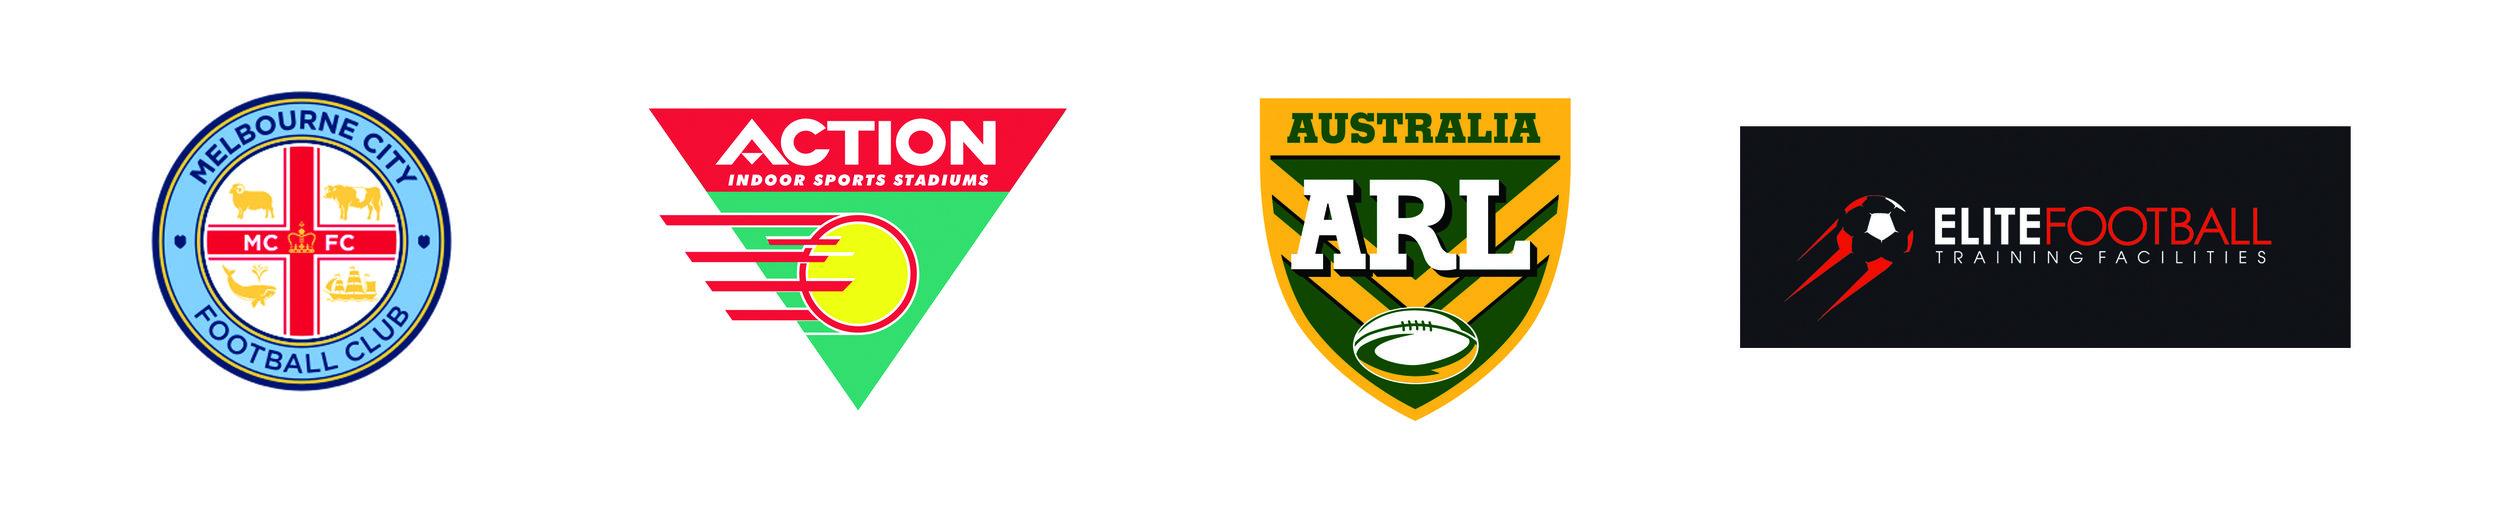 Sport - 2 - All services - new logos.jpg